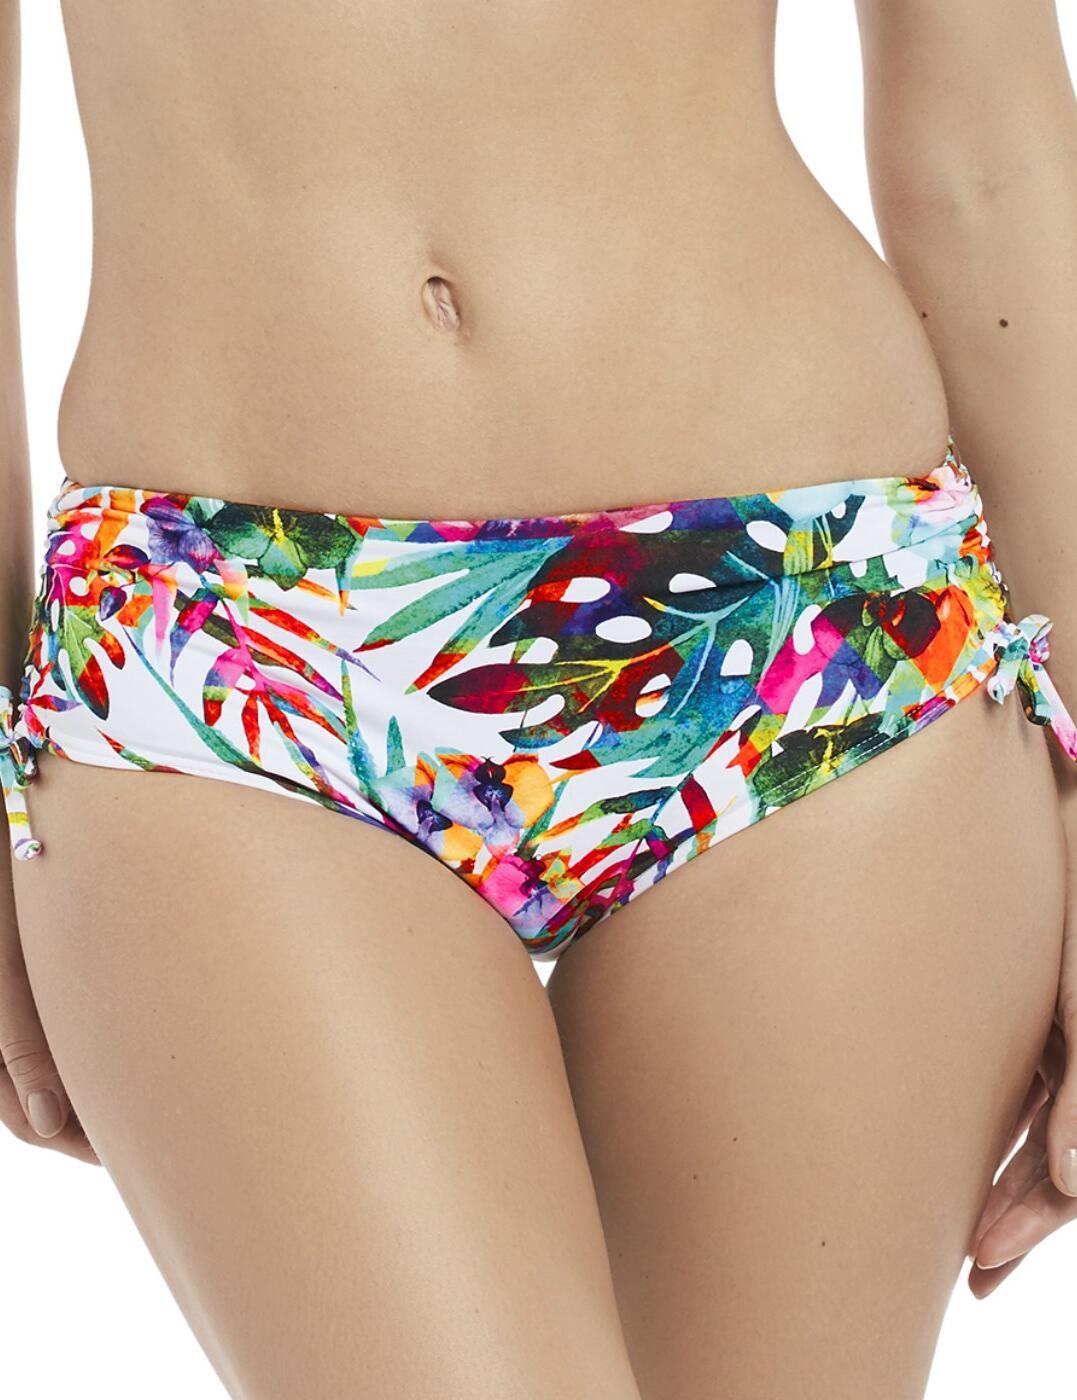 6392 Fantasie Margarita Island Adjustable Leg-Short - 6392 Multi